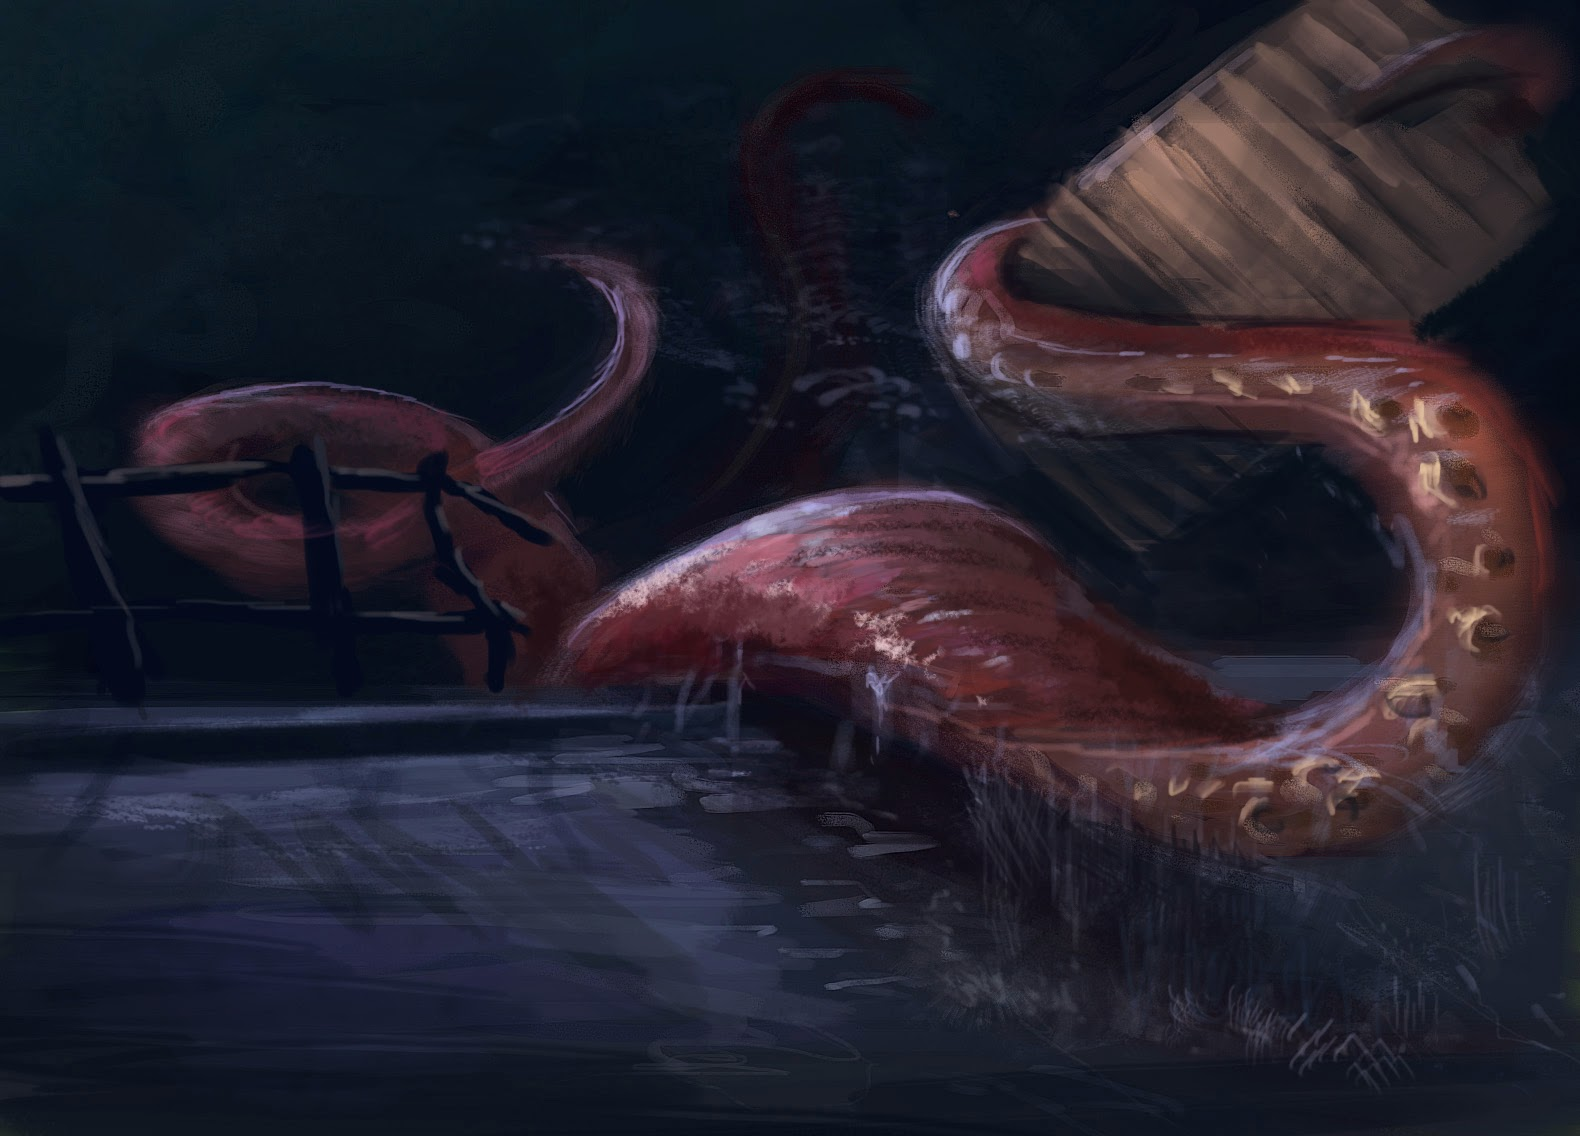 Octopus Attacking Human Octopus Attack Human